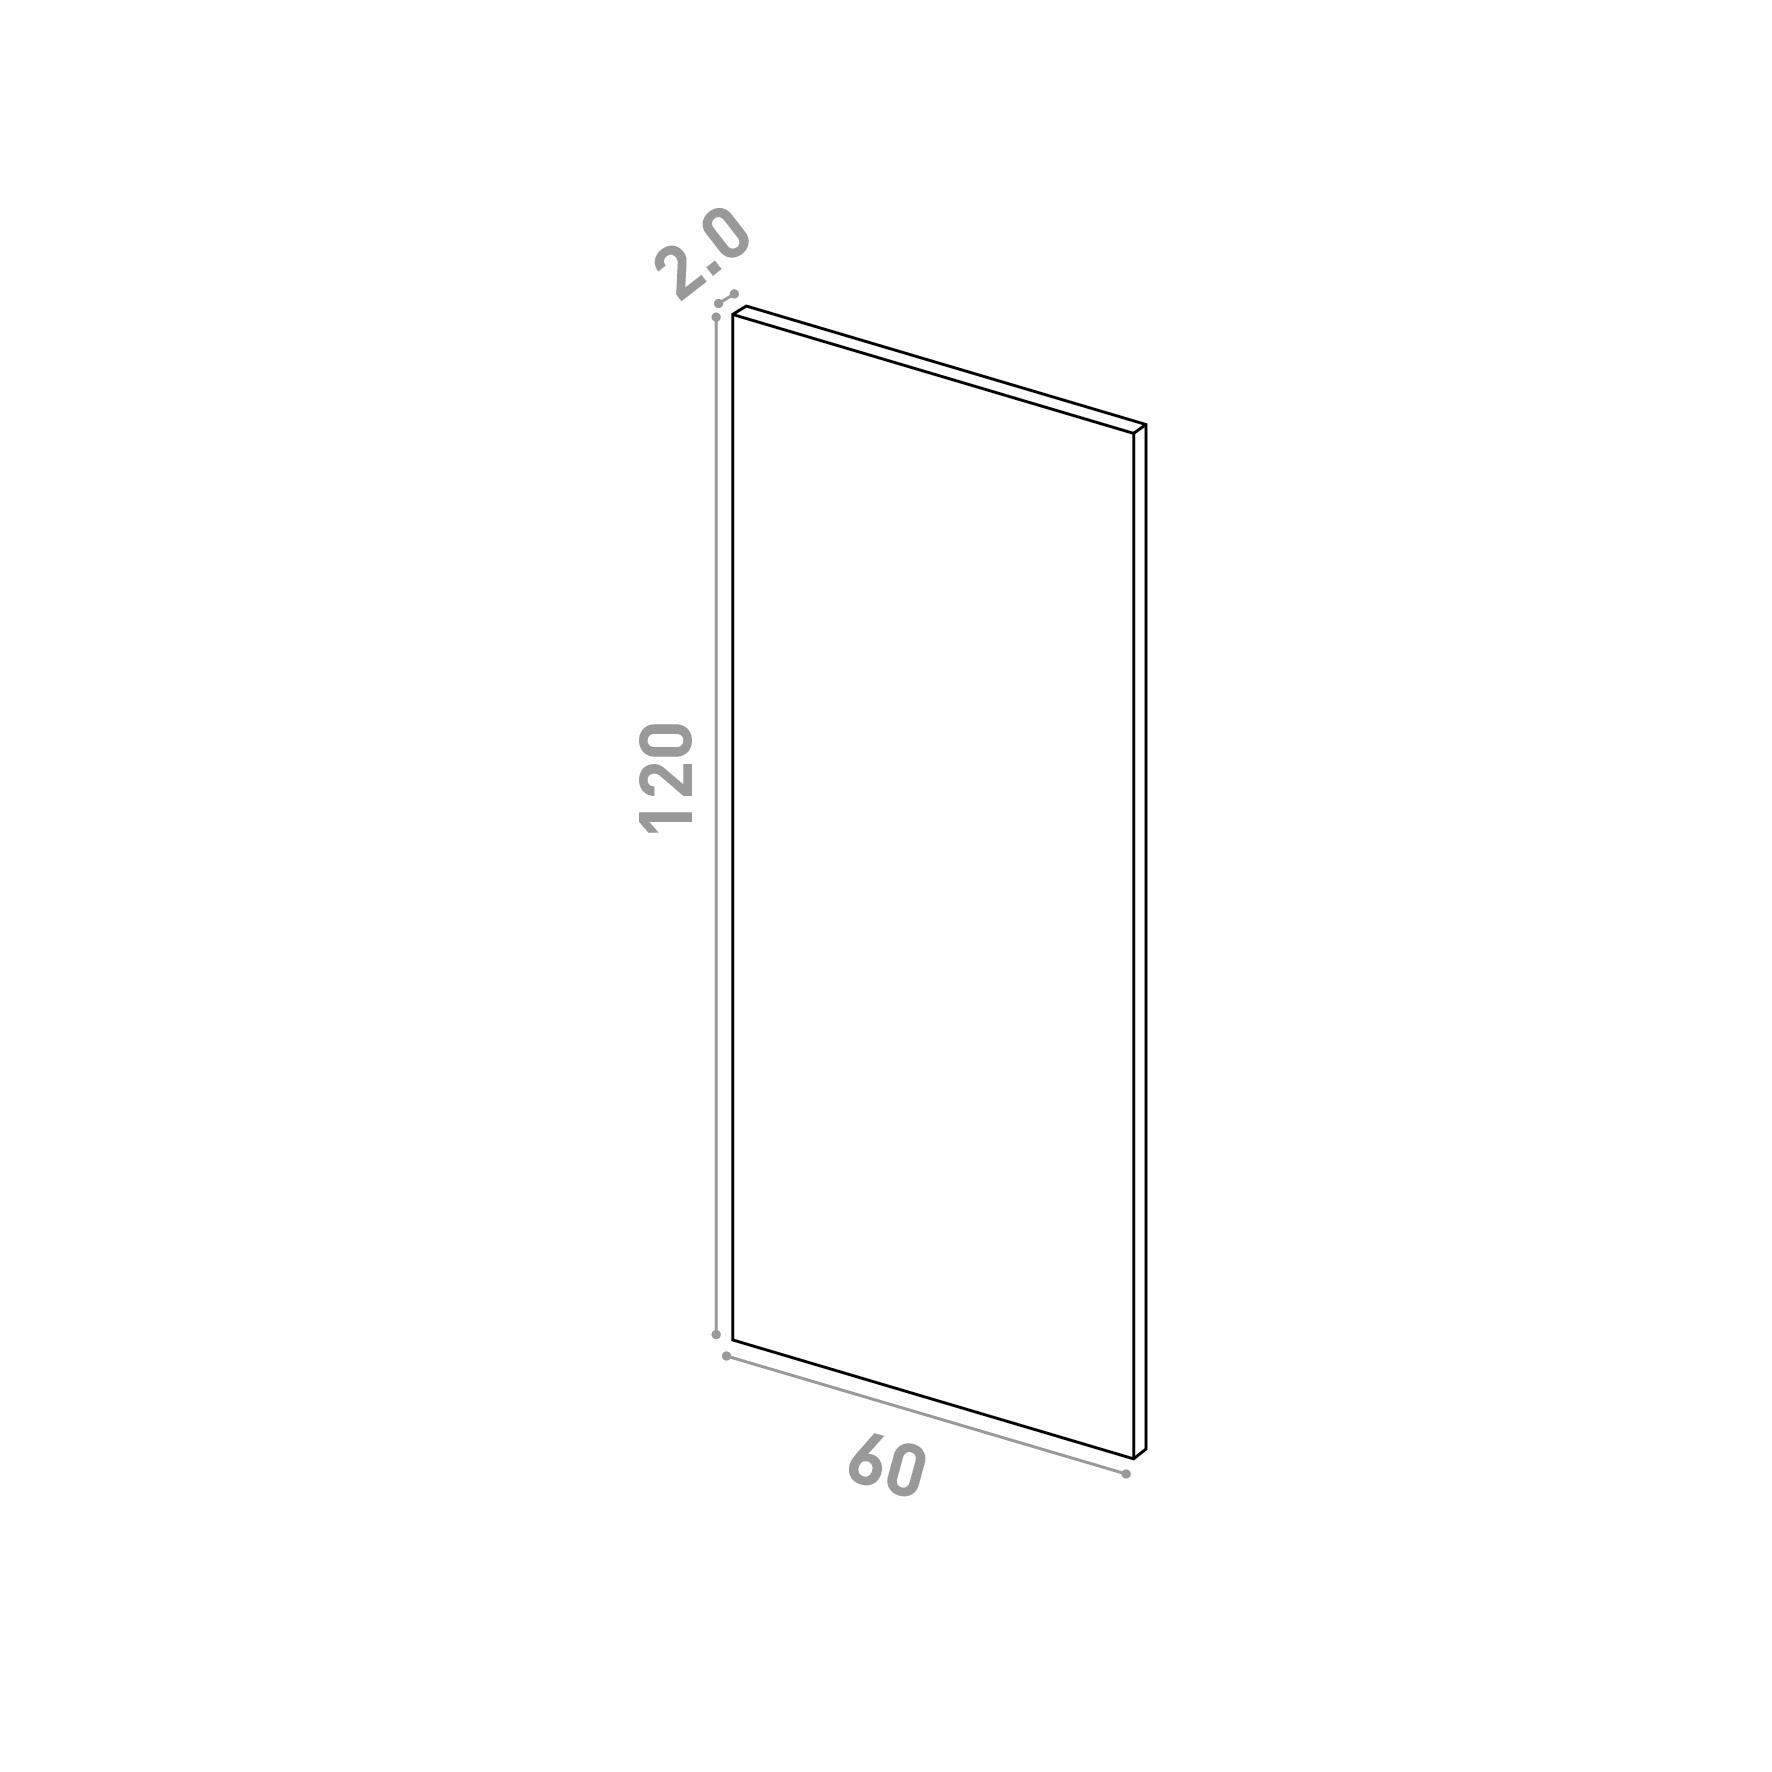 Porte 60X120cm   design lisse   chêne naturel